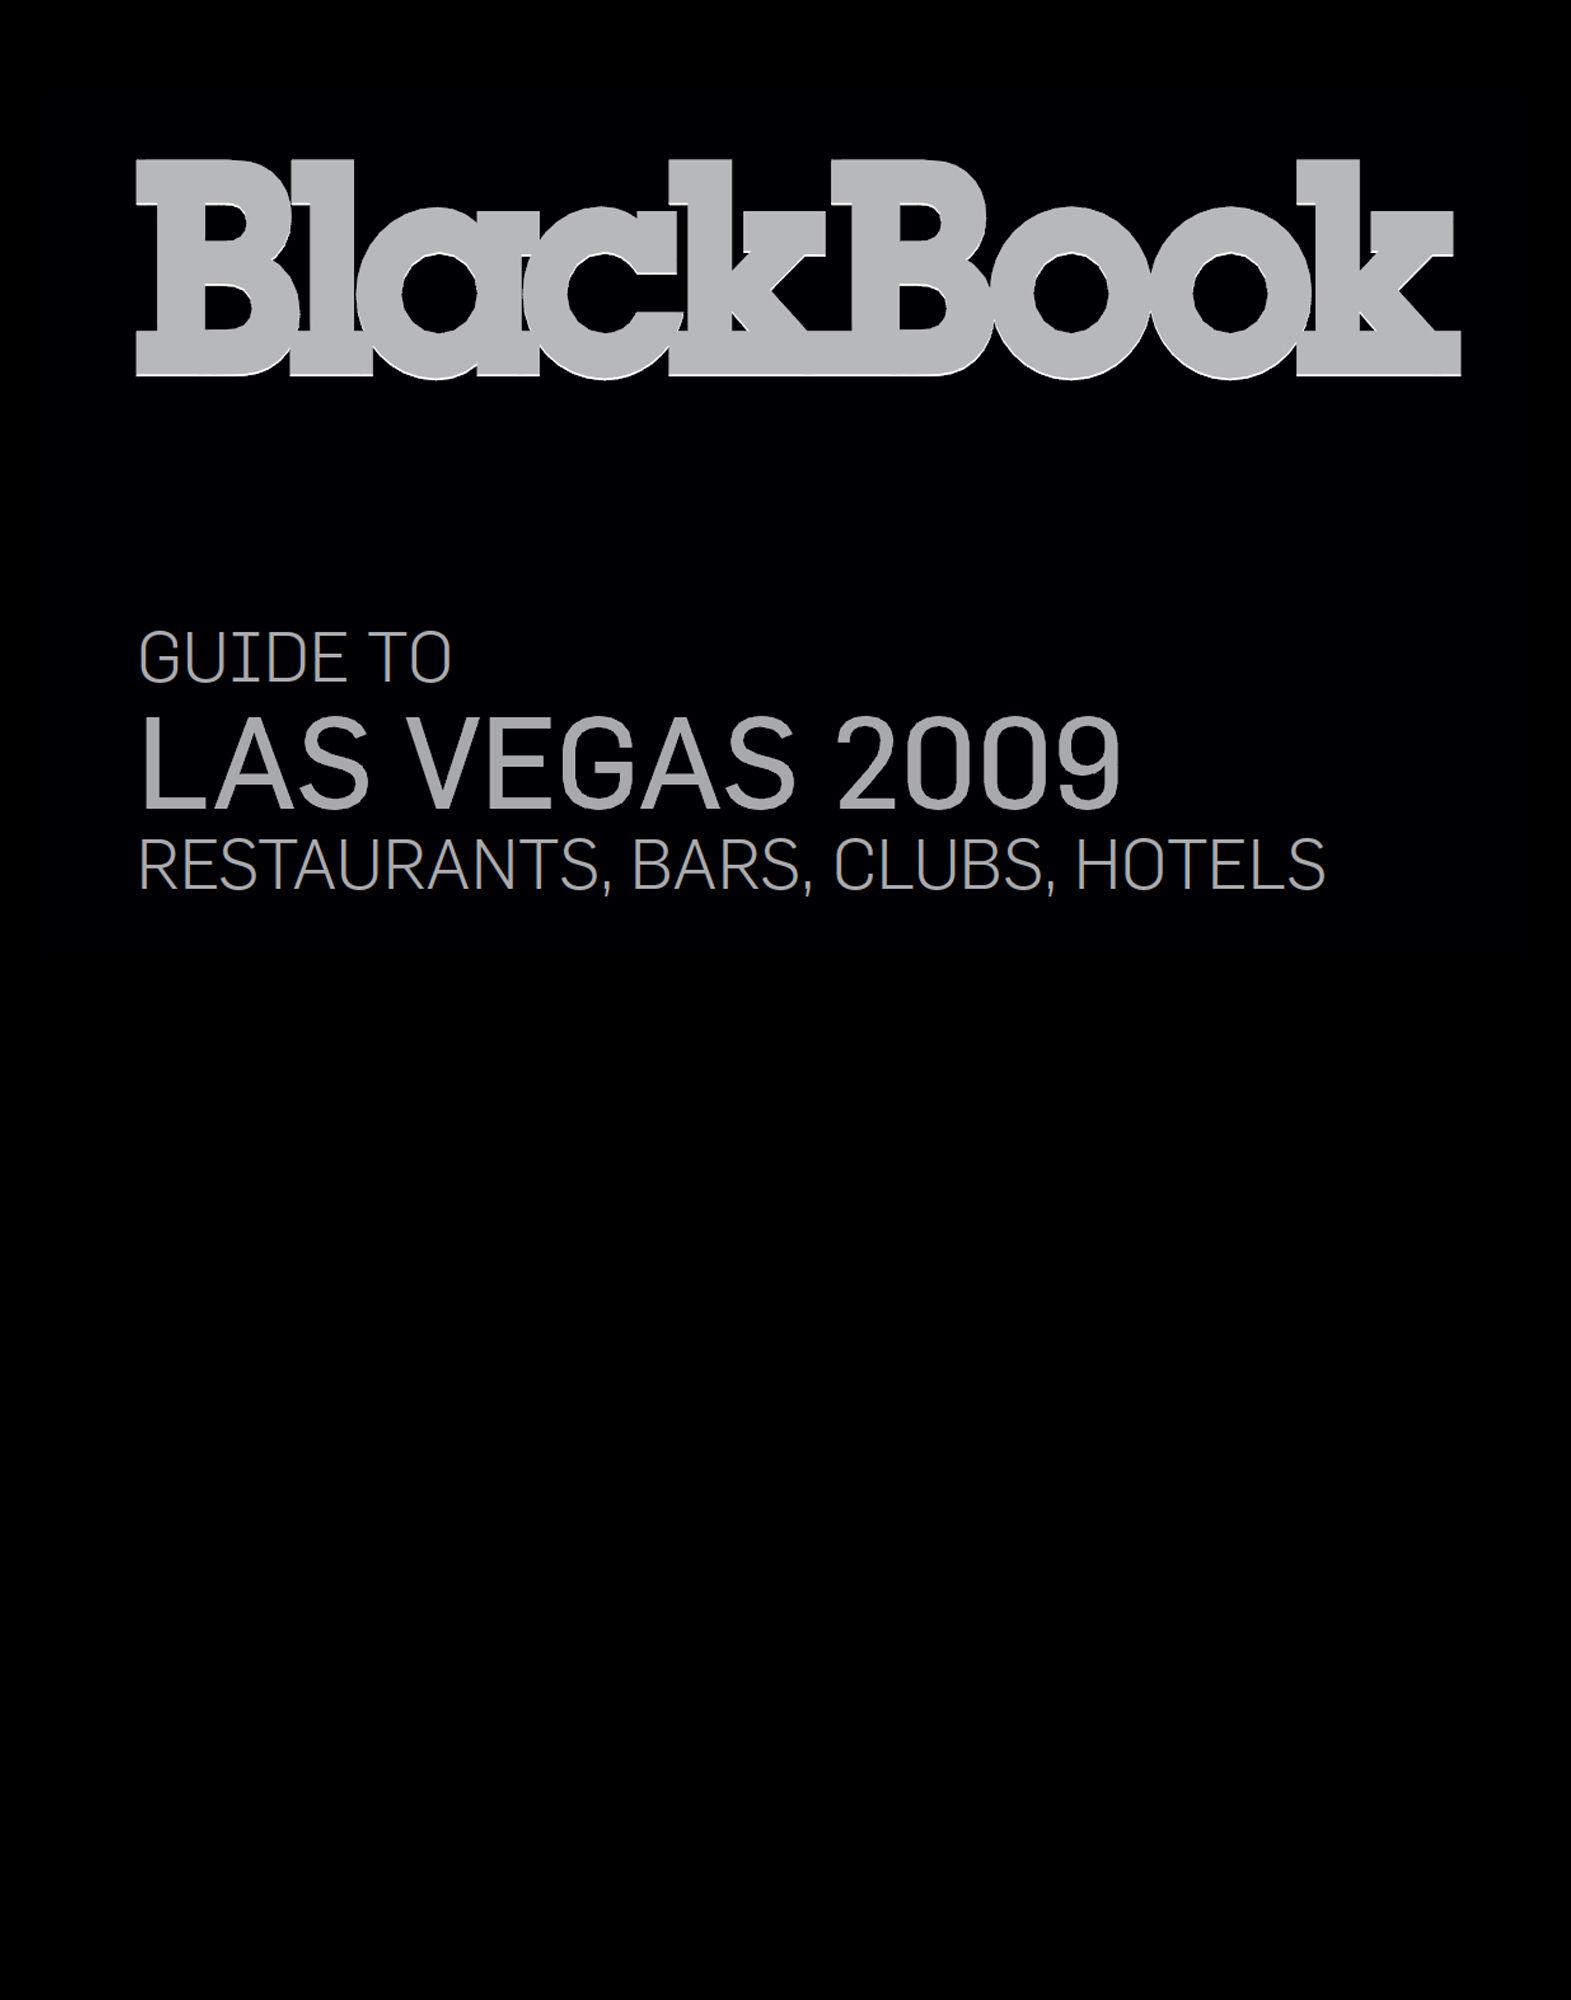 BLACKBOOK GUIDE LIFESTYLE  Item 56000502 1